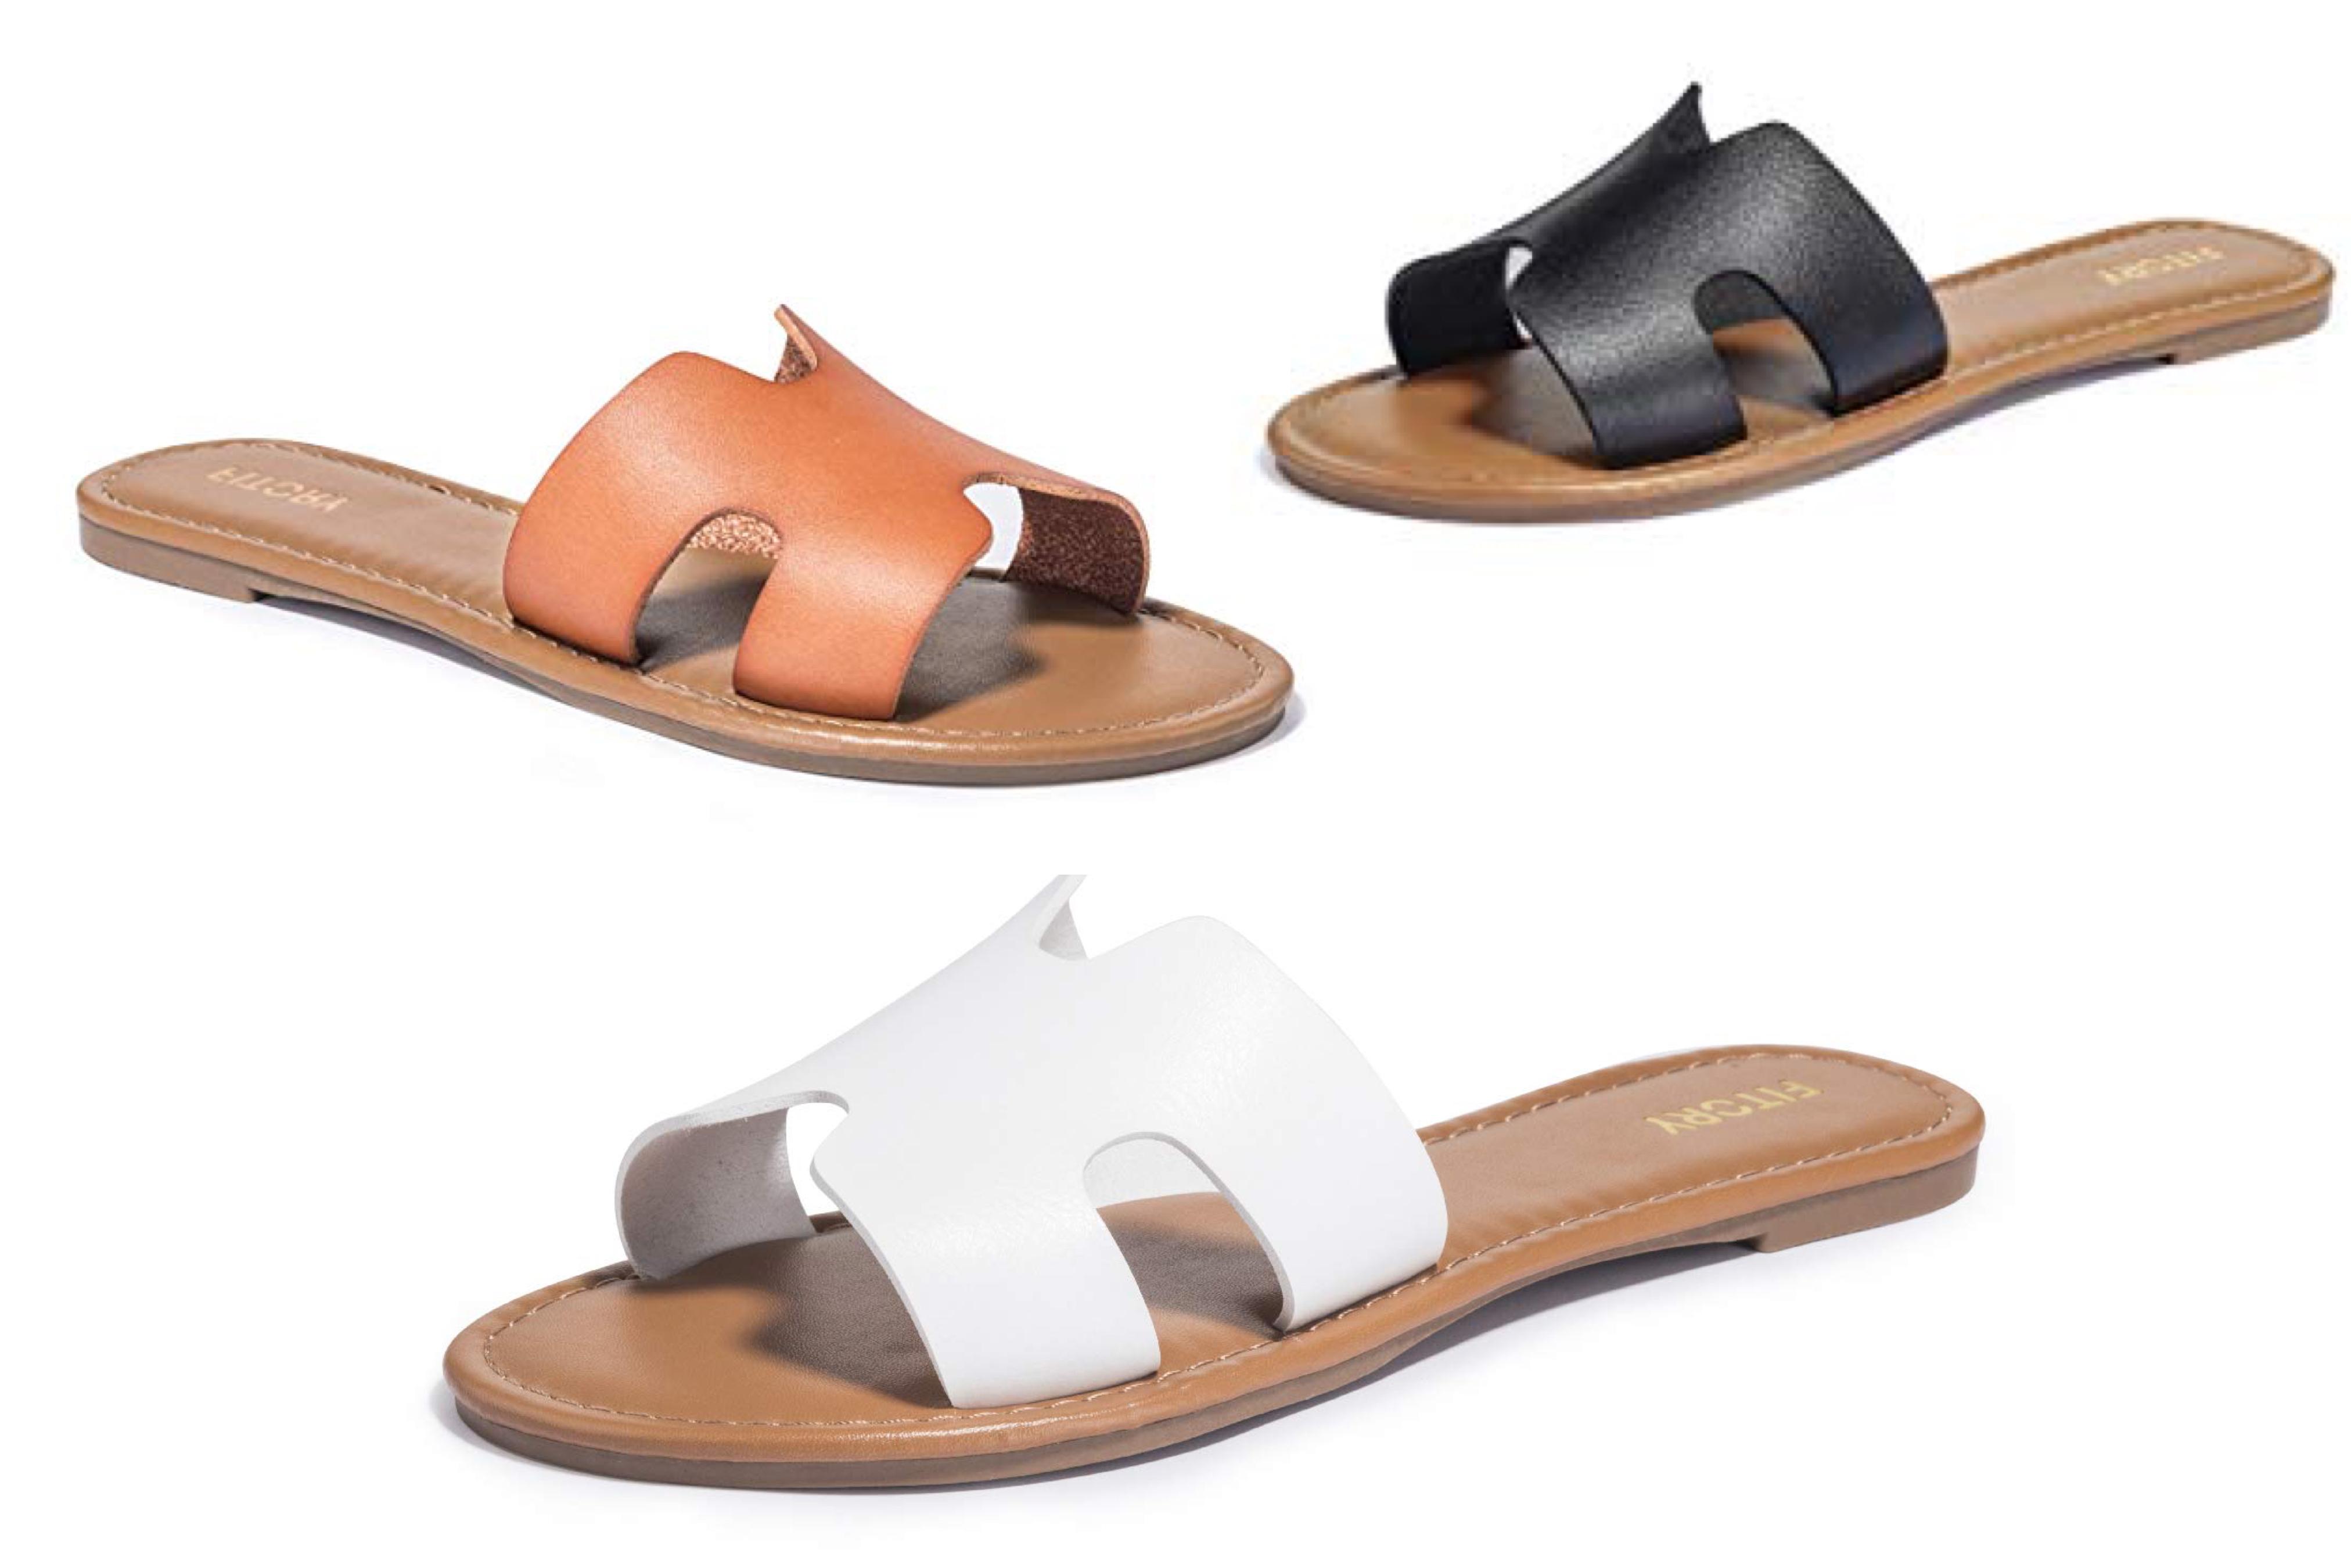 Fitory Women's Flat Sandals